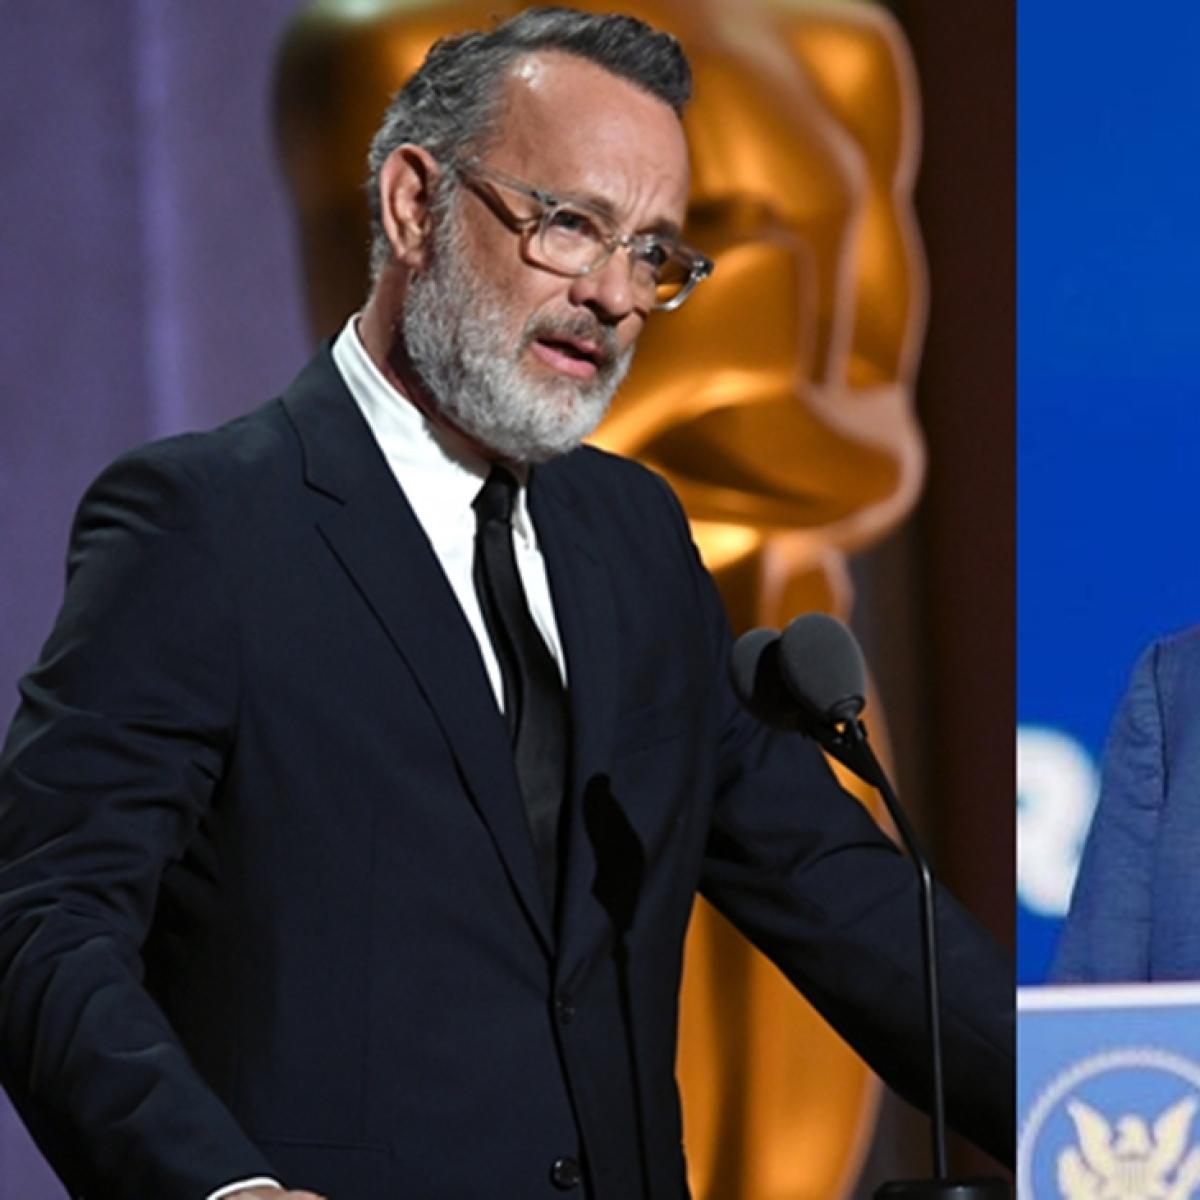 Celebrating America: Actor Tom Hanks to host a 90-minute TV show for Joe Biden's inauguration